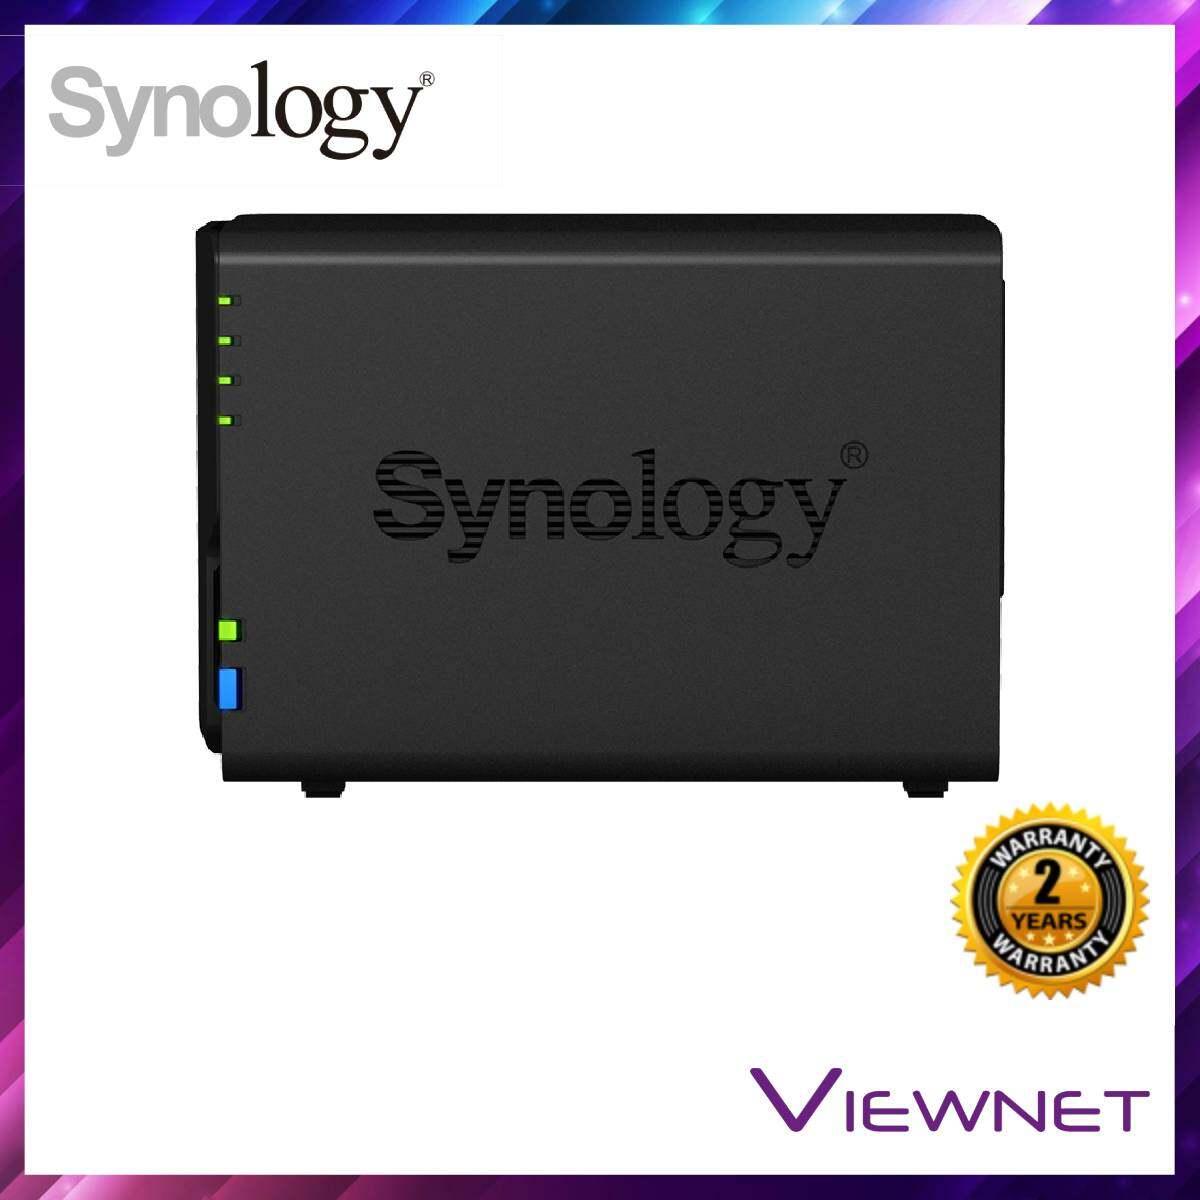 Synology Enclosure 2-BAYS/Intel Celeron J3355/DC 2.0GHz/2GB NAS (DS218+)